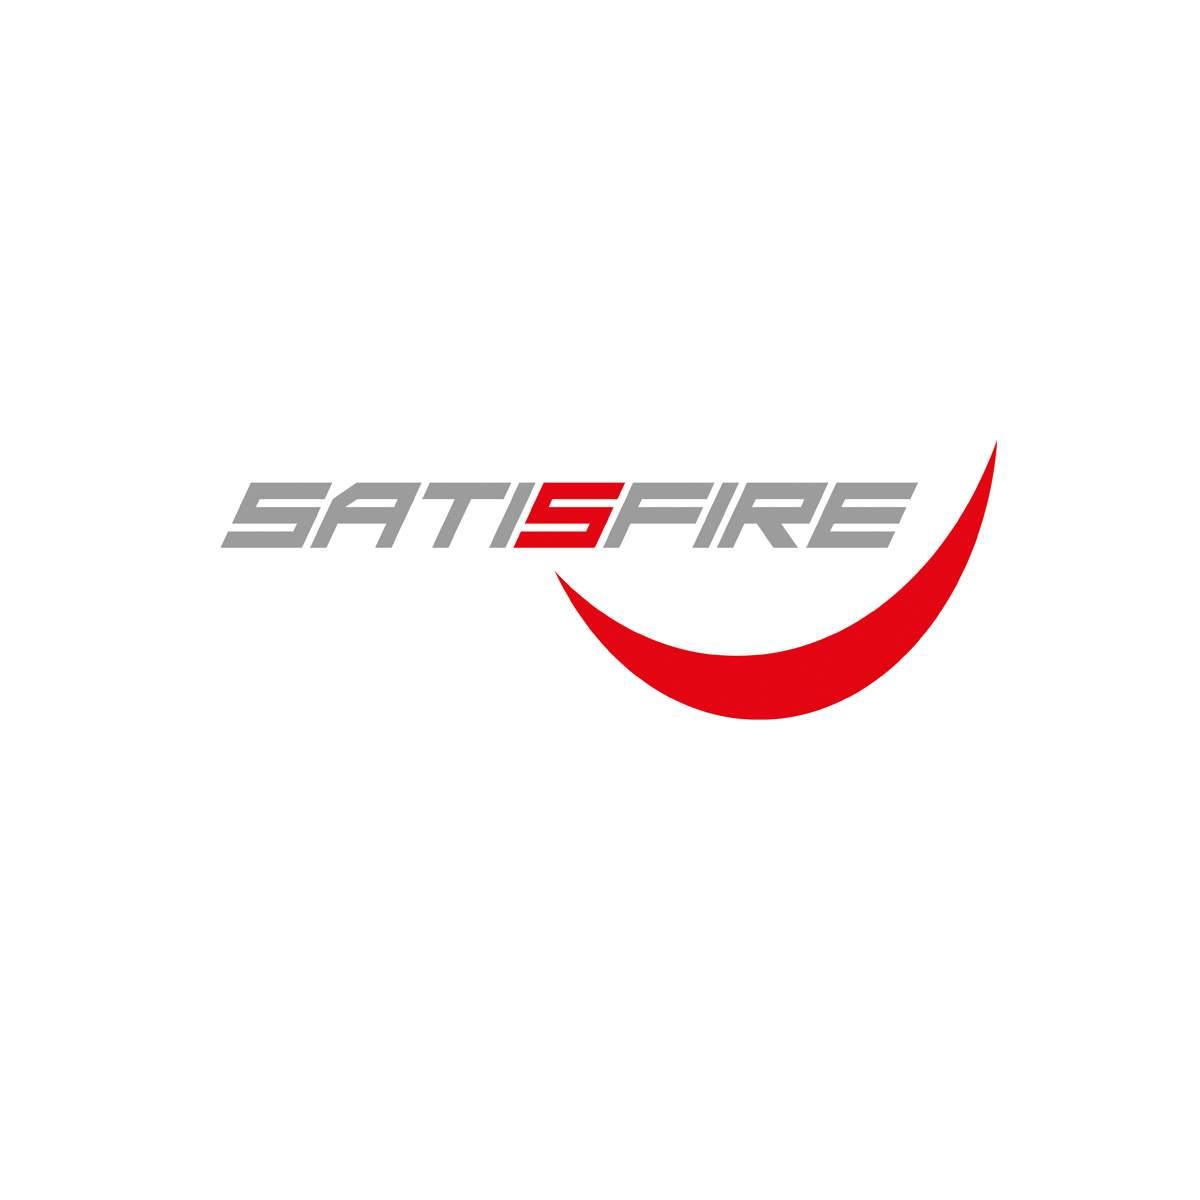 satisfire lichterkette logo party lichteffekte beleuchtung events9JsycKG8b2WMP